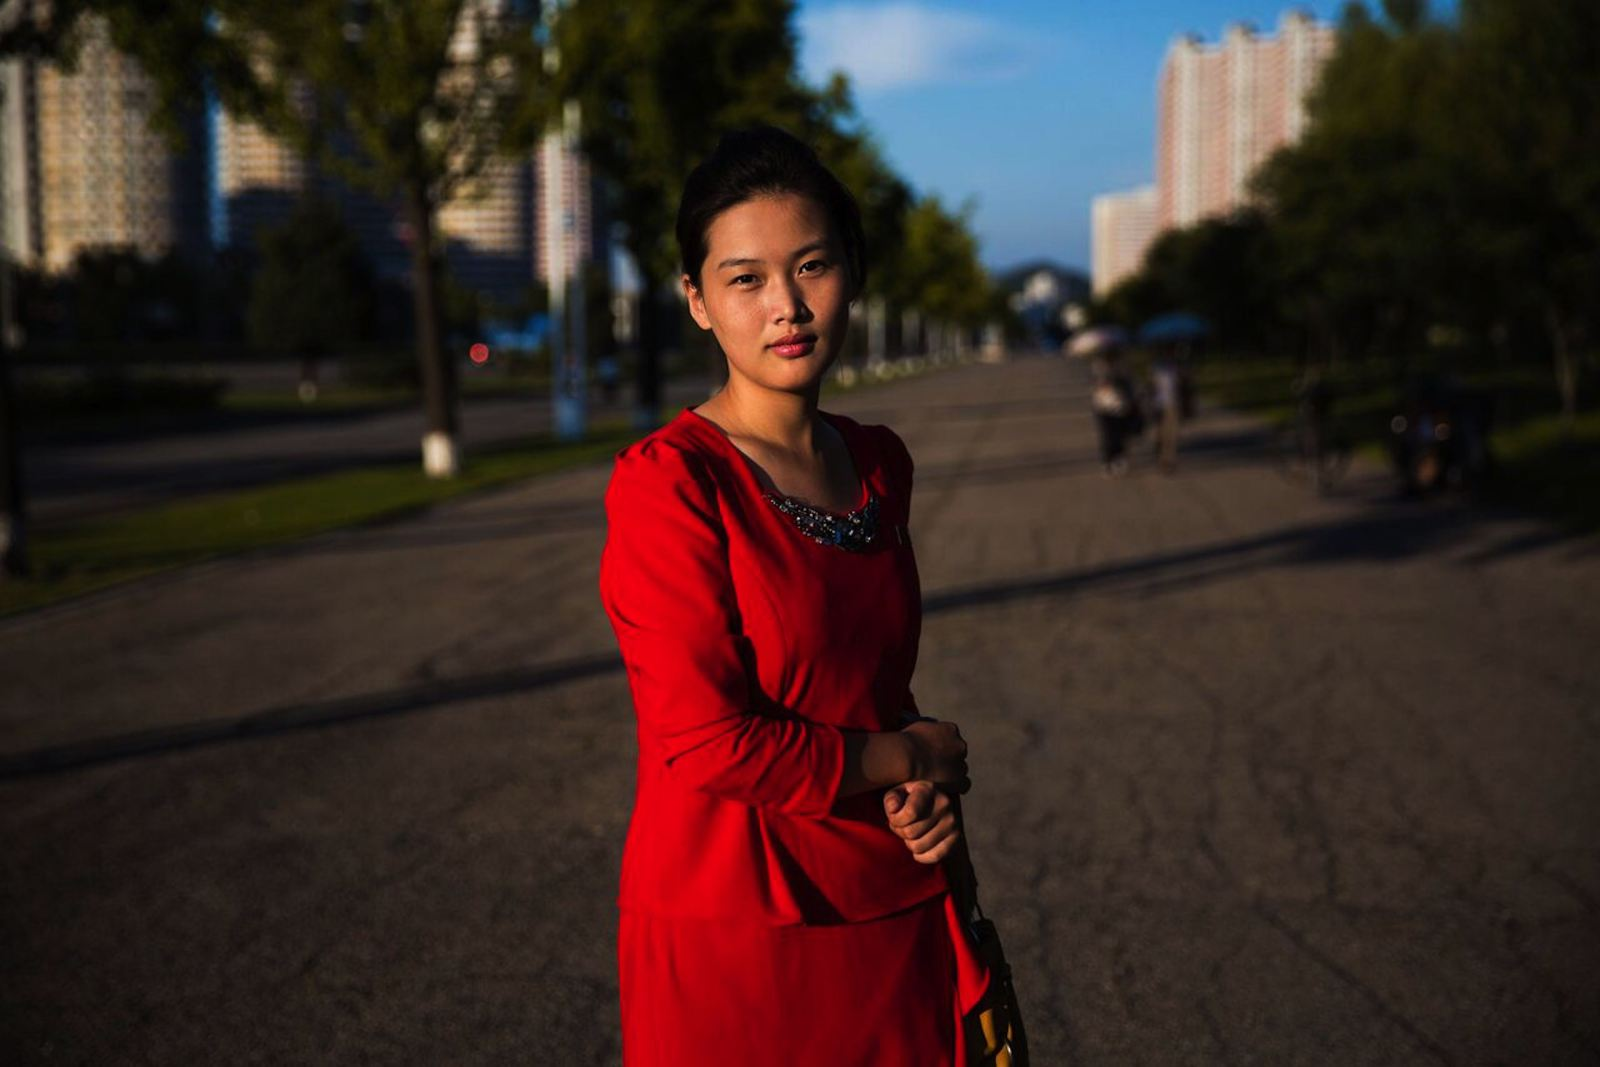 Photographer provides rare portrait of N. Korean women's